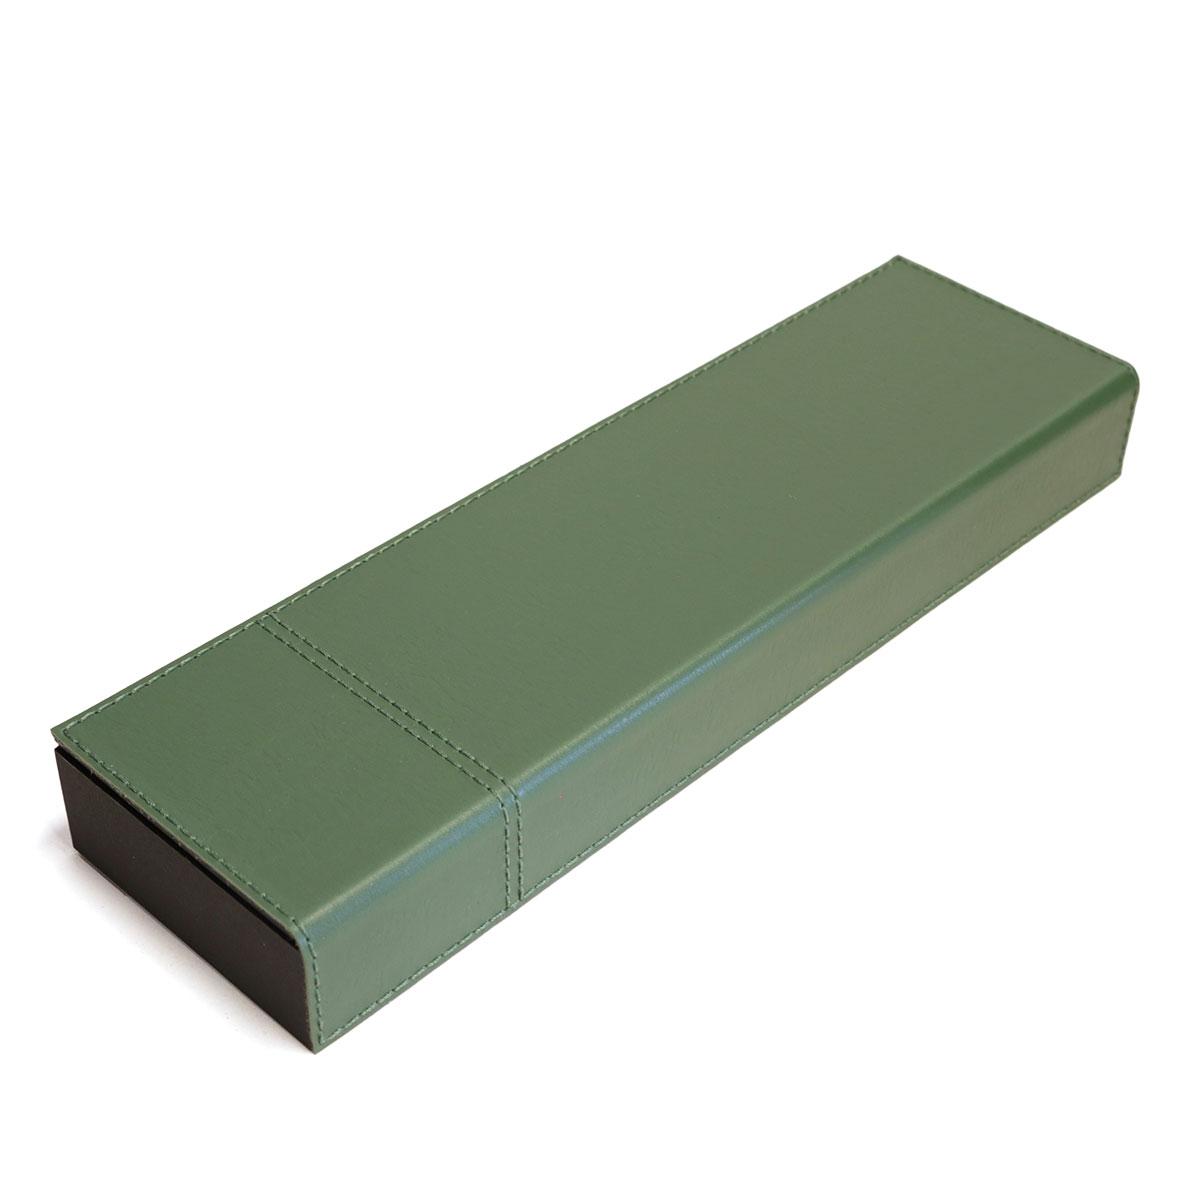 Caixa office pen (Montana Verde Musgo)